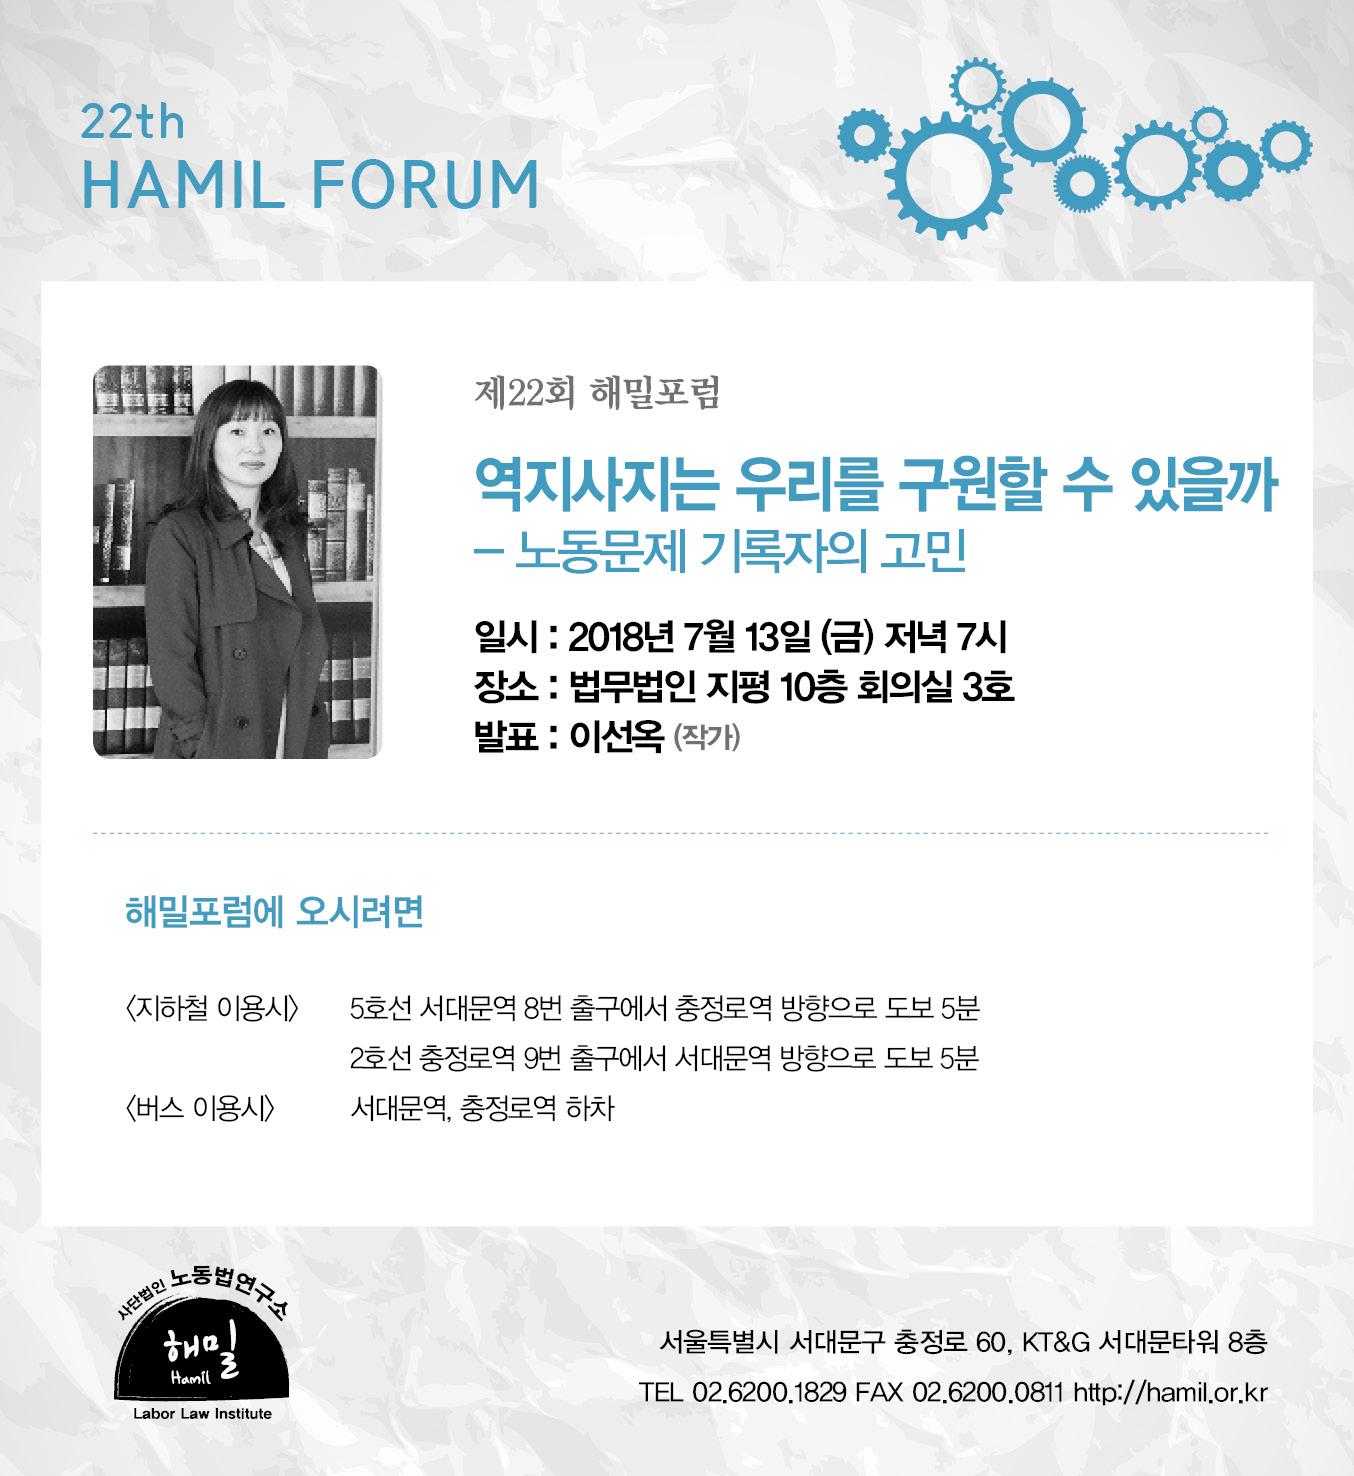 hamil_forum_22.jpg